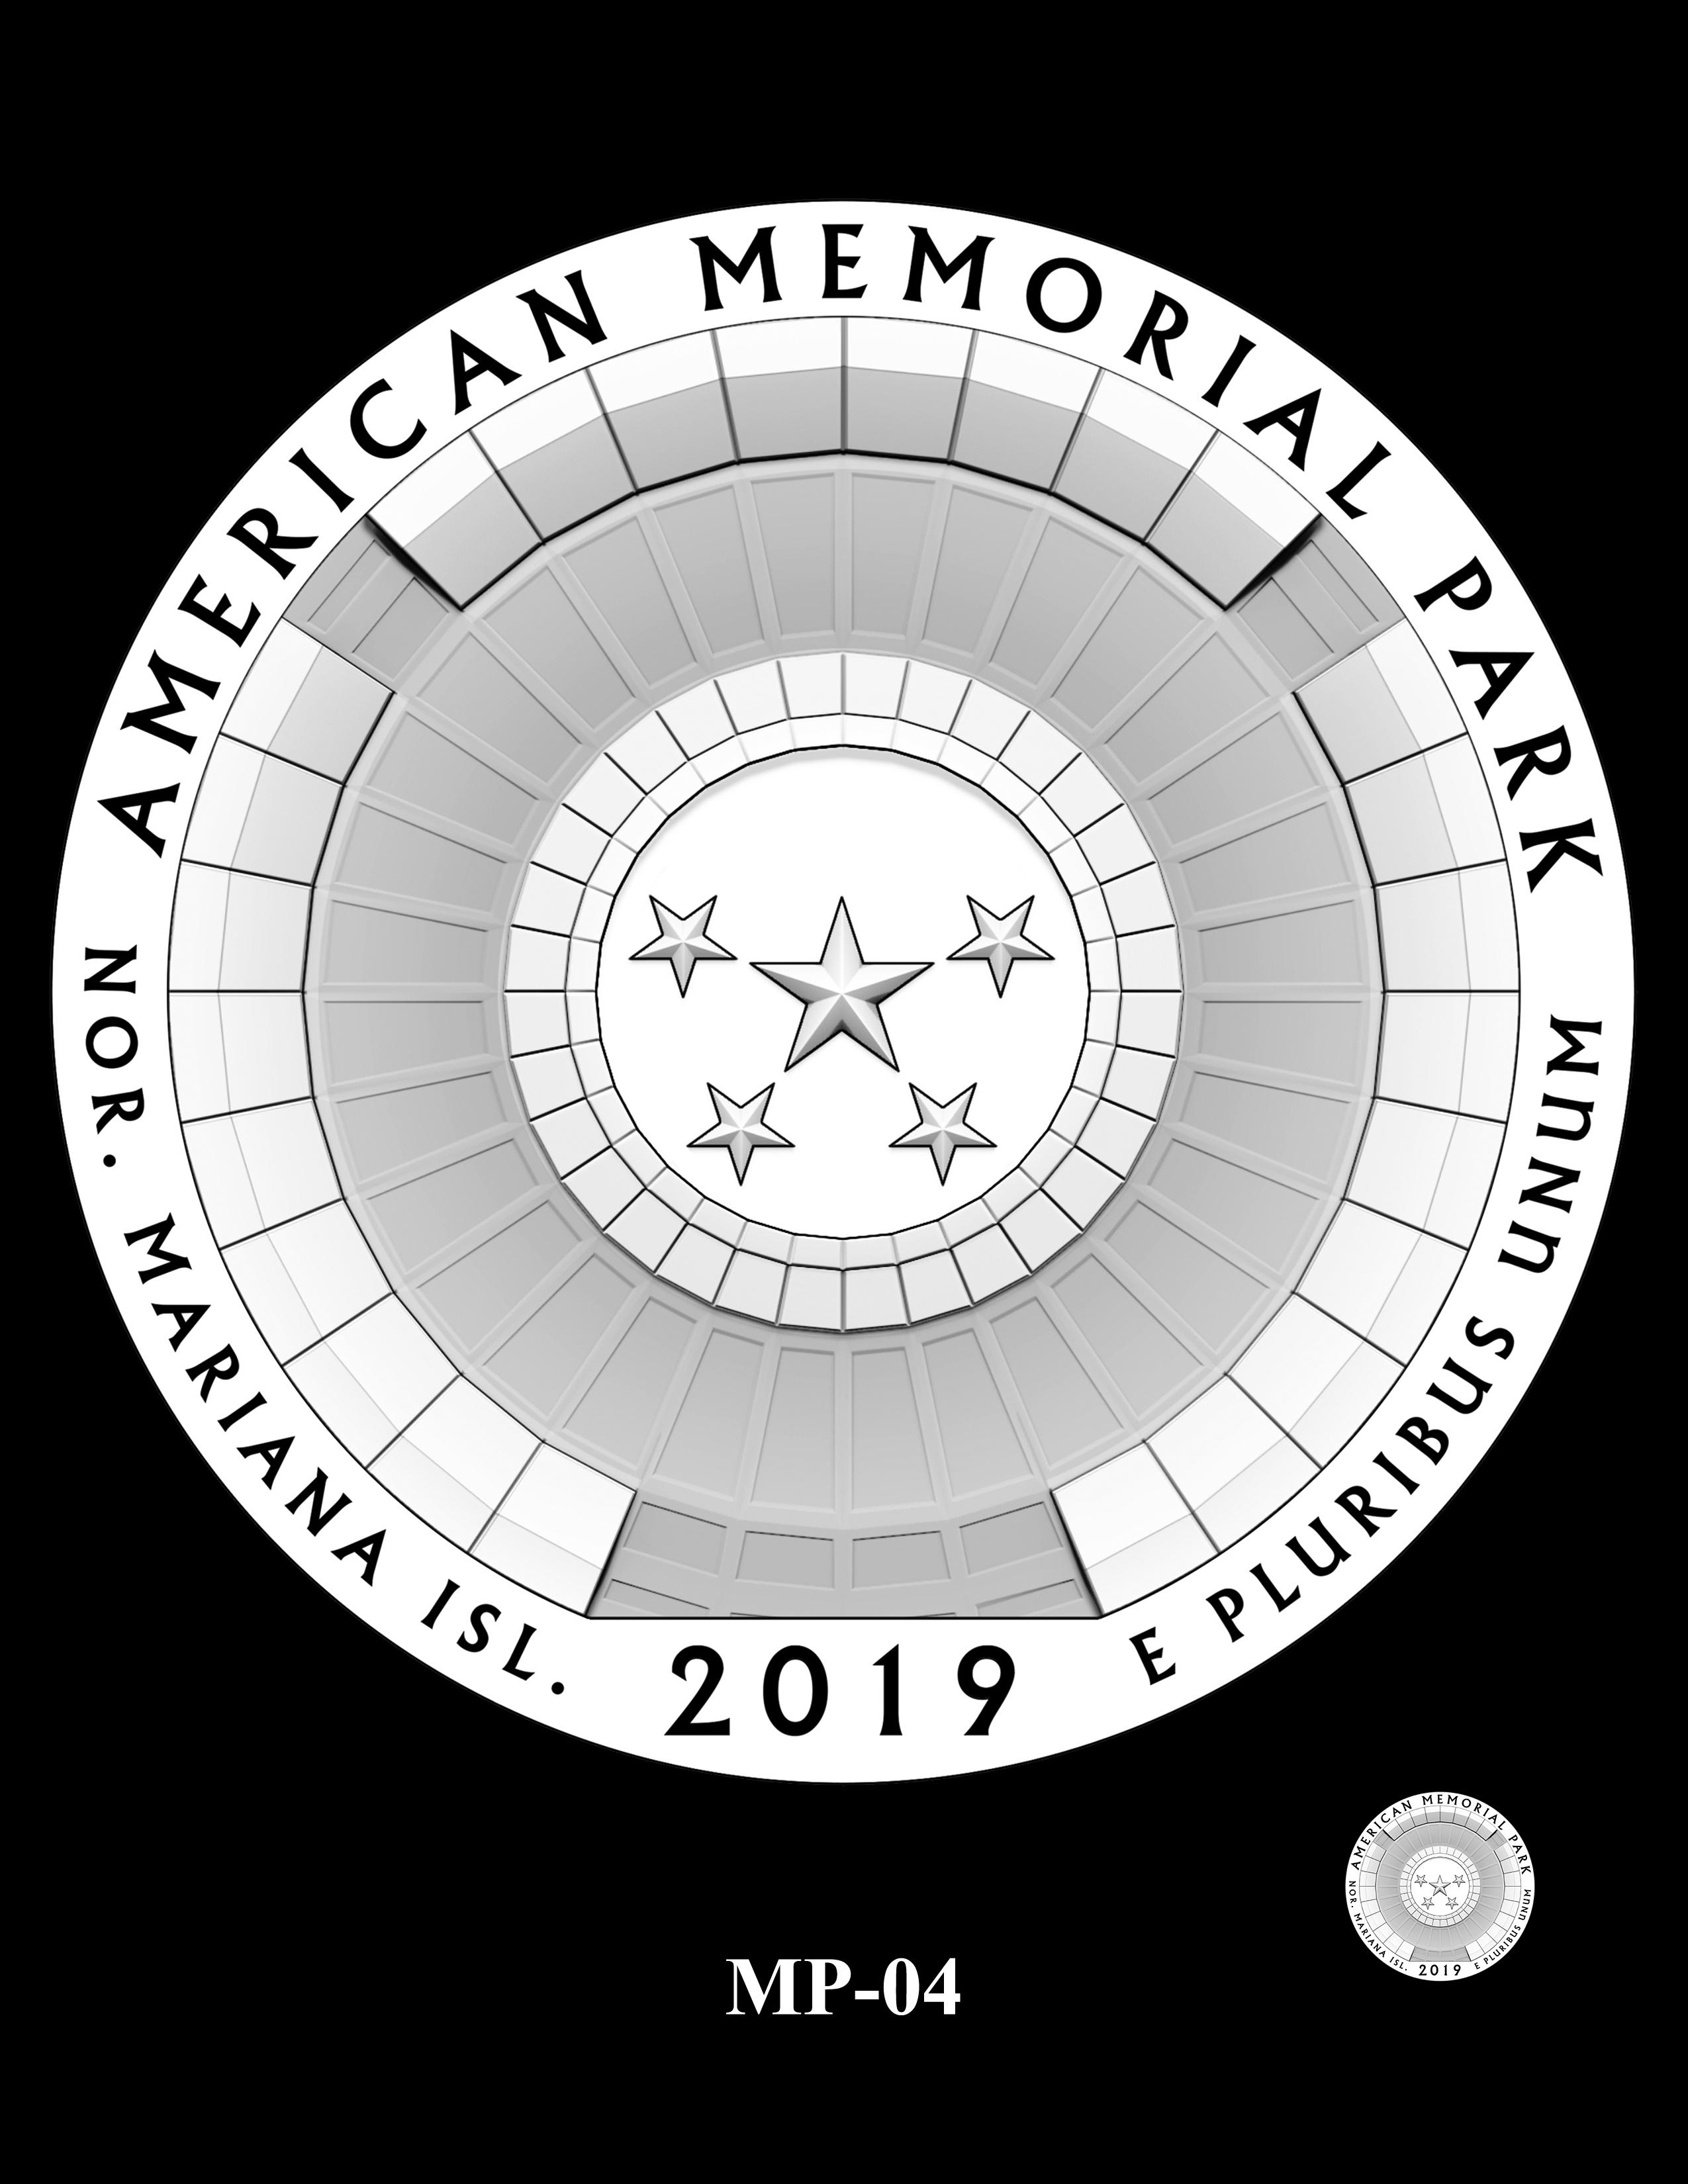 MP-04 -- 2019 America the Beautiful Quarters® Program